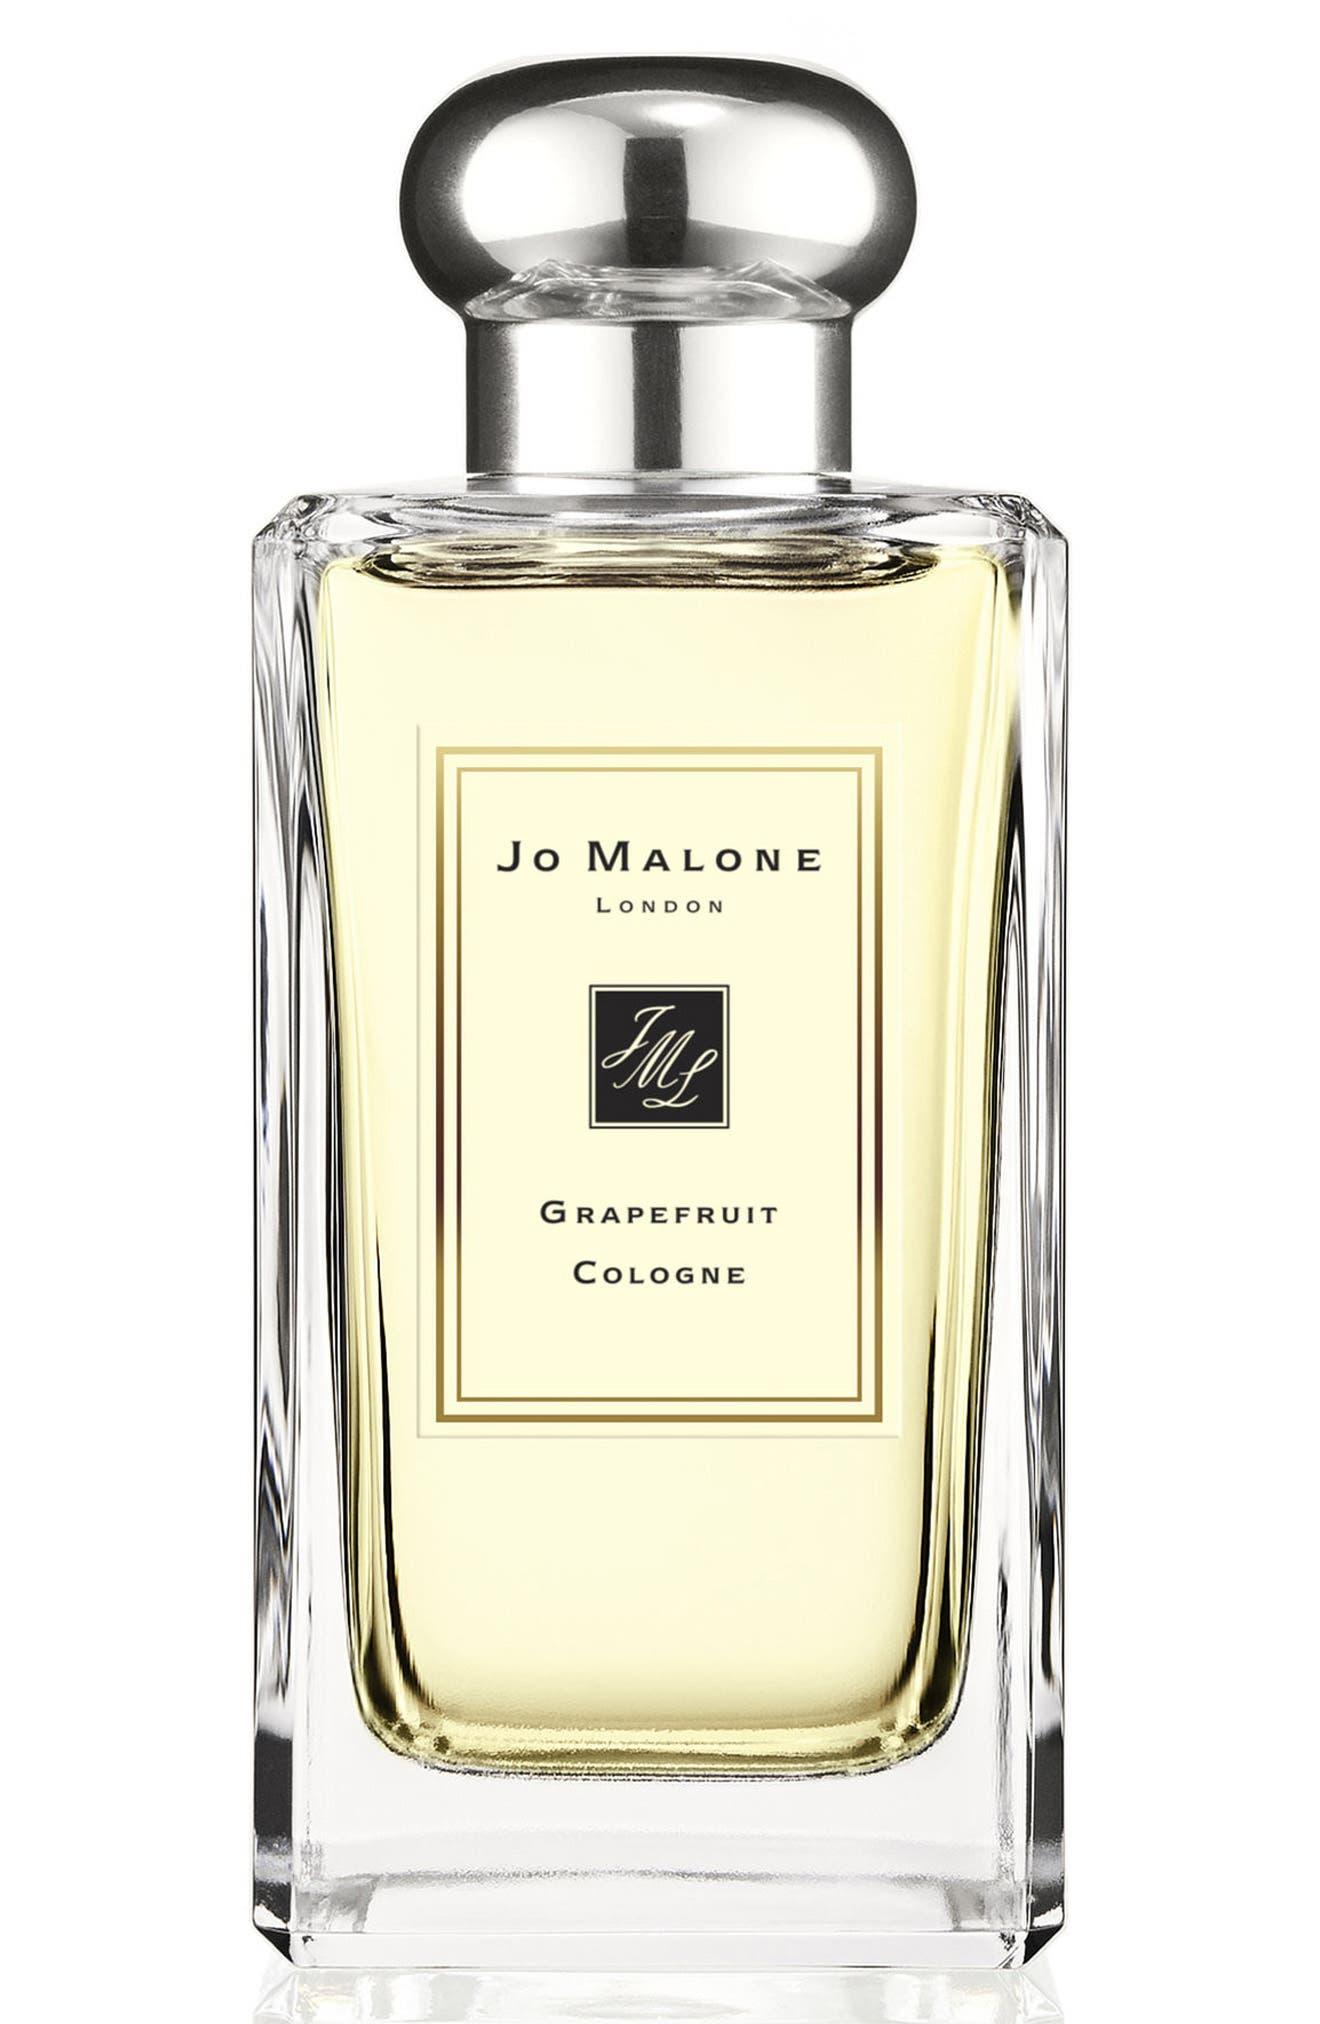 Alternate Image 1 Selected - Jo Malone London™ 'Grapefruit' Cologne (3.4 oz.)